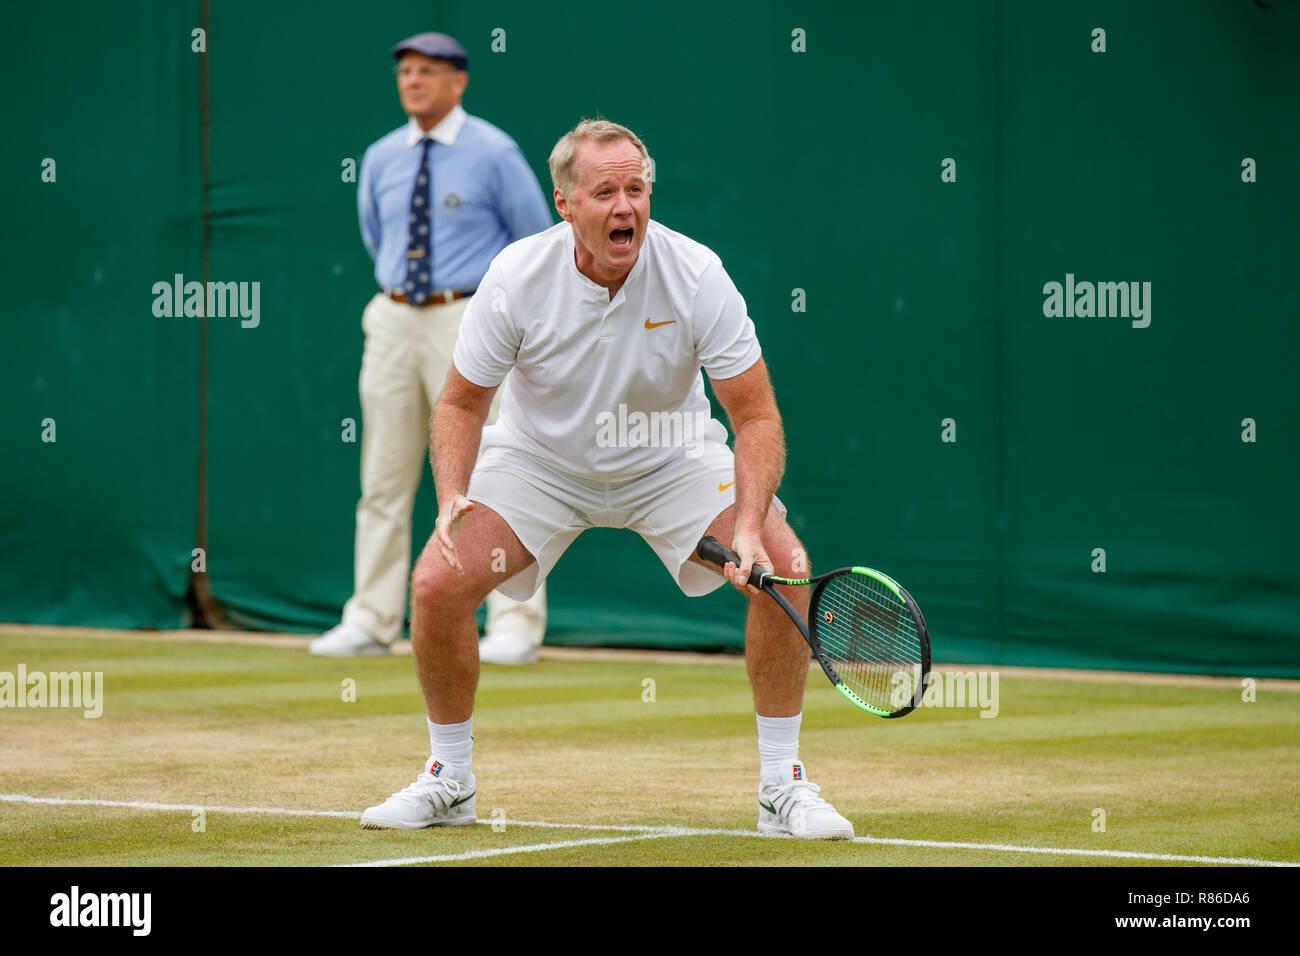 Tennis legend Patrick McEnroe during the Wimbledon Championships 2019 - Stock Image